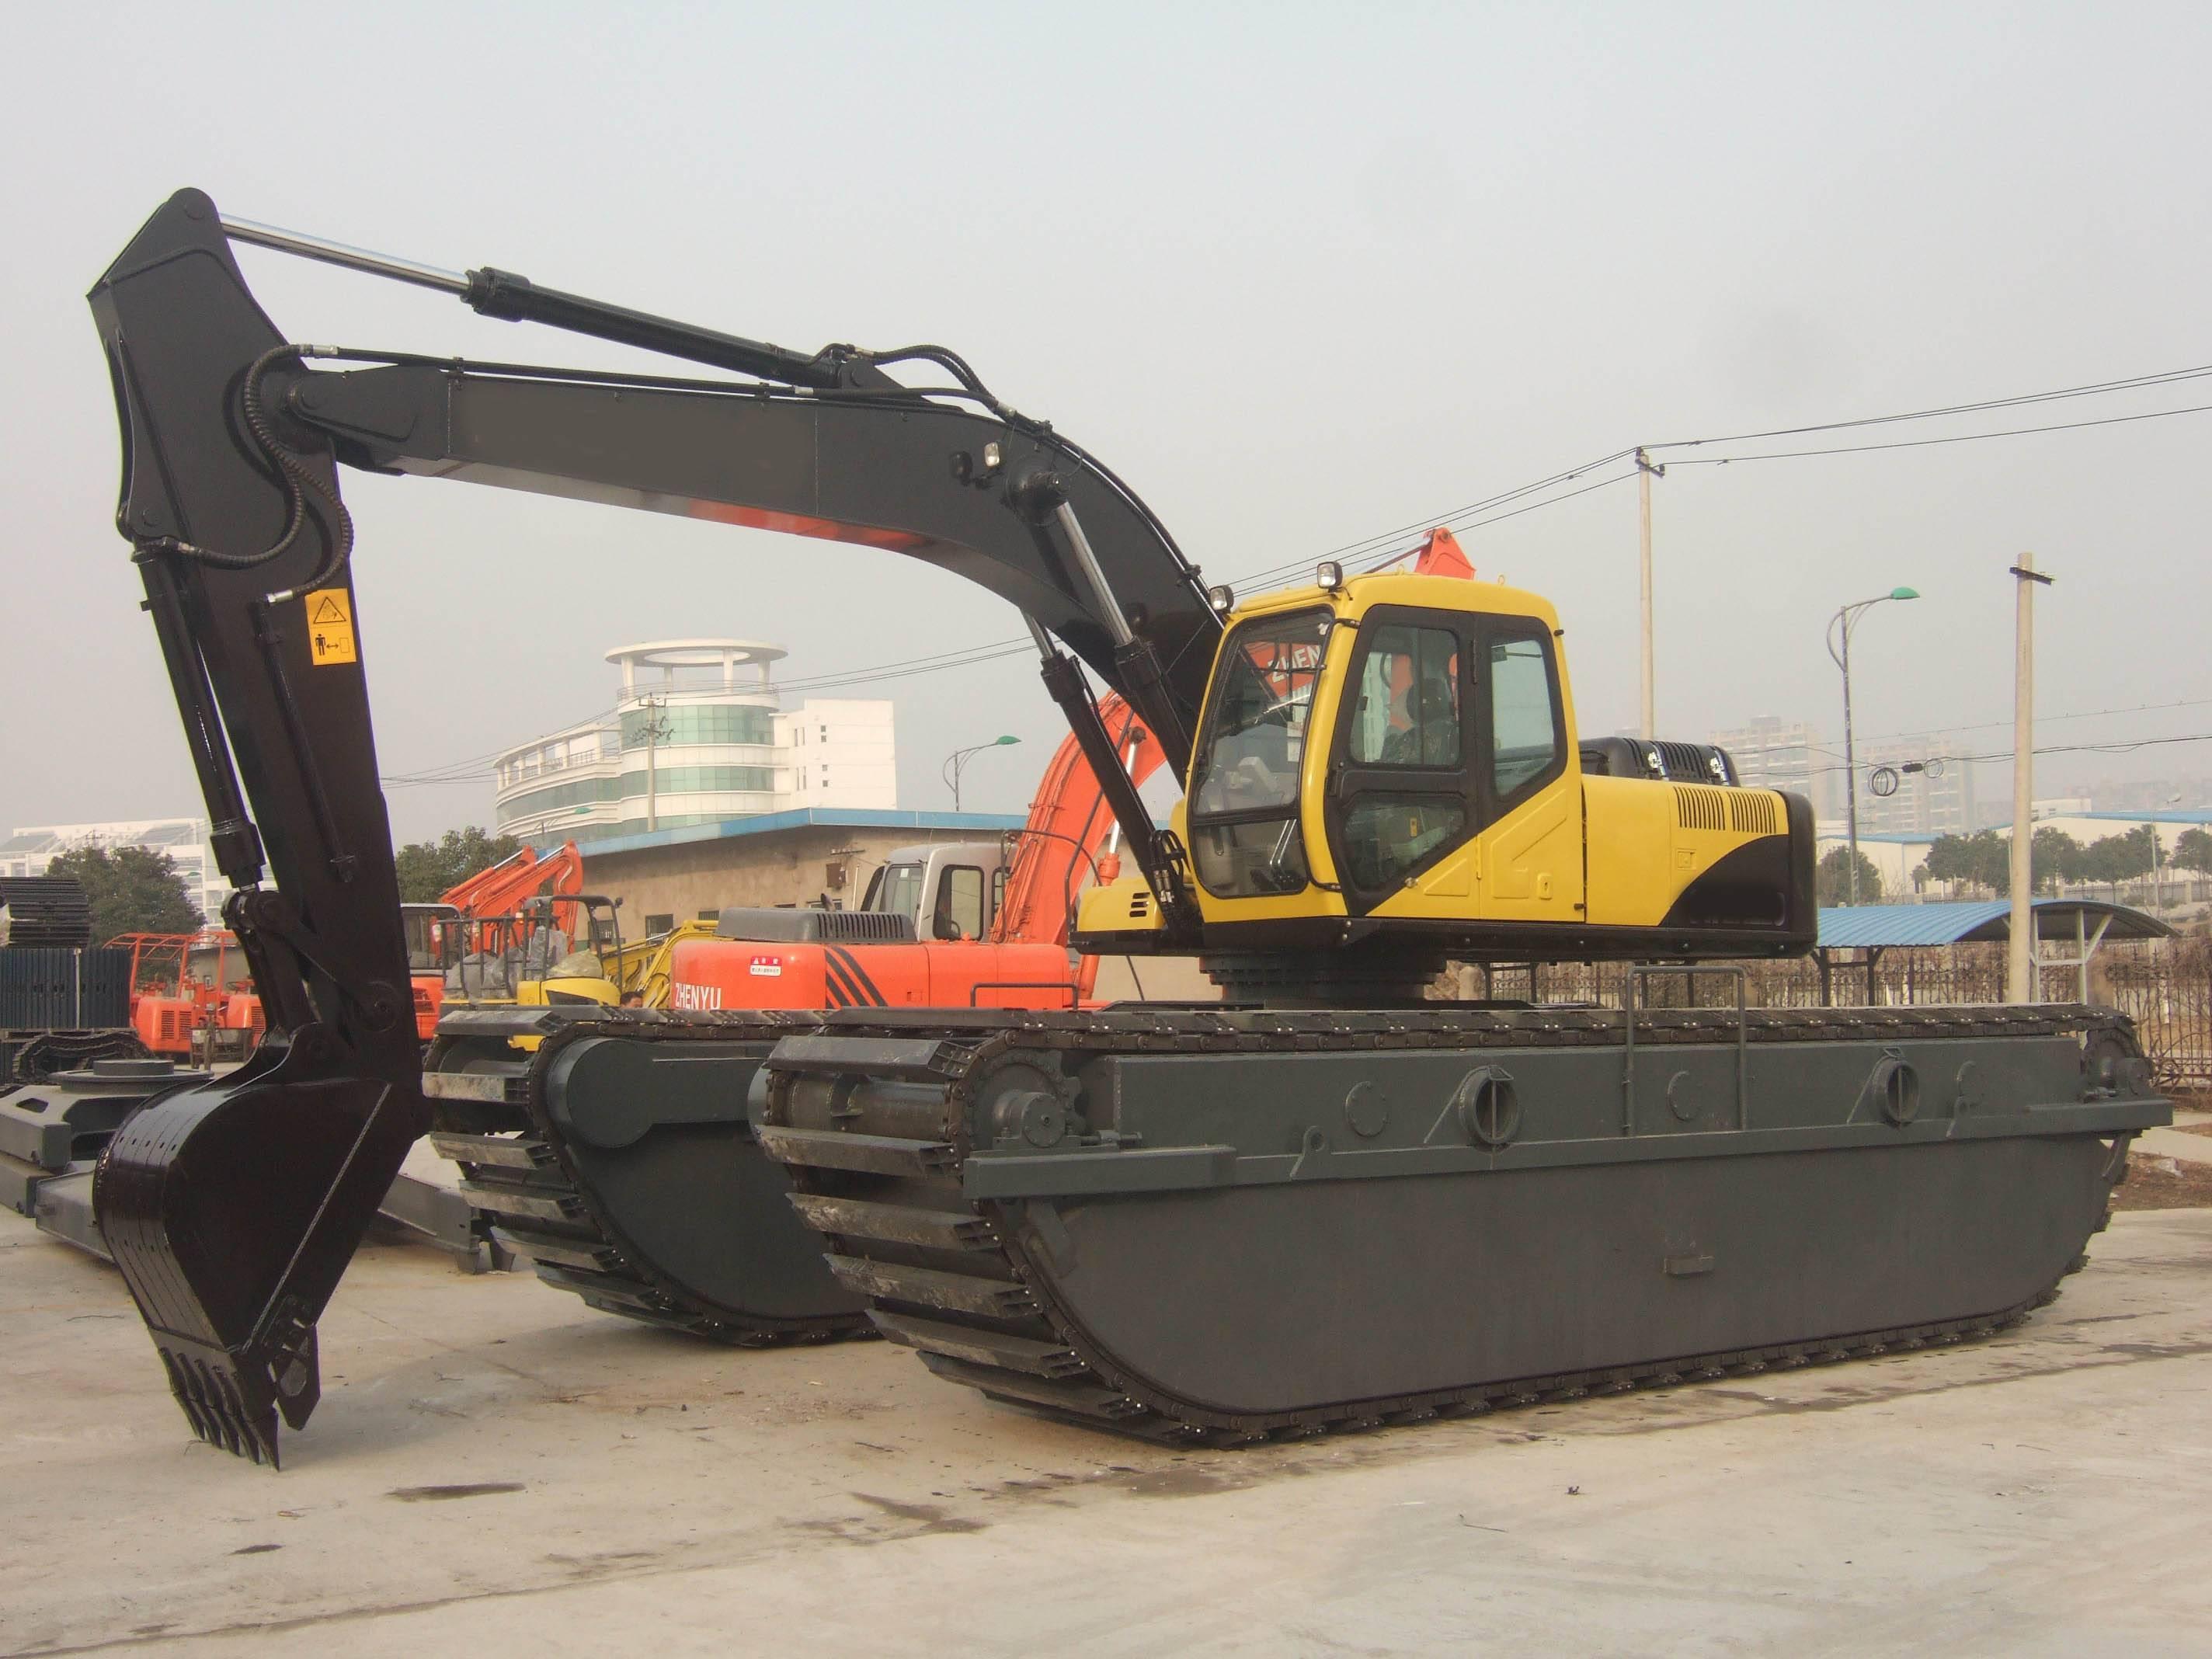 21tons Amphibious Excavator, AE210SD